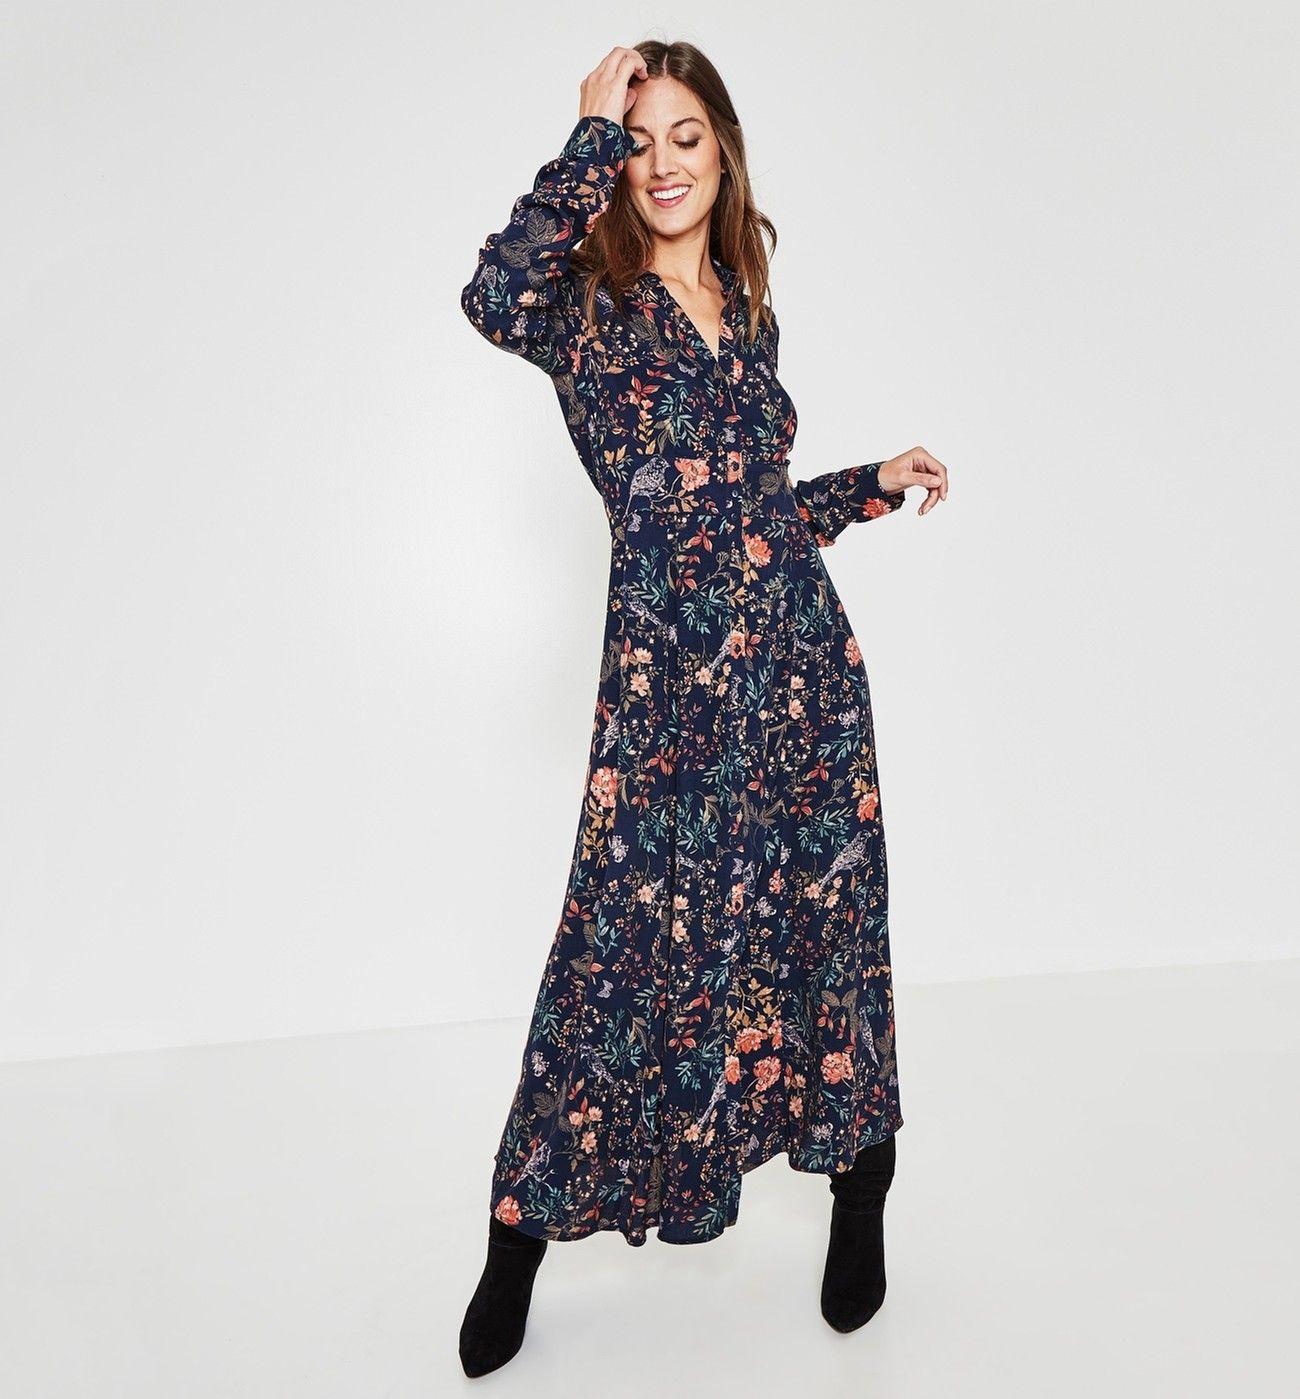 Maxi-Hemdblusenkleid - Schwarz gemustert - Damen - Kleider